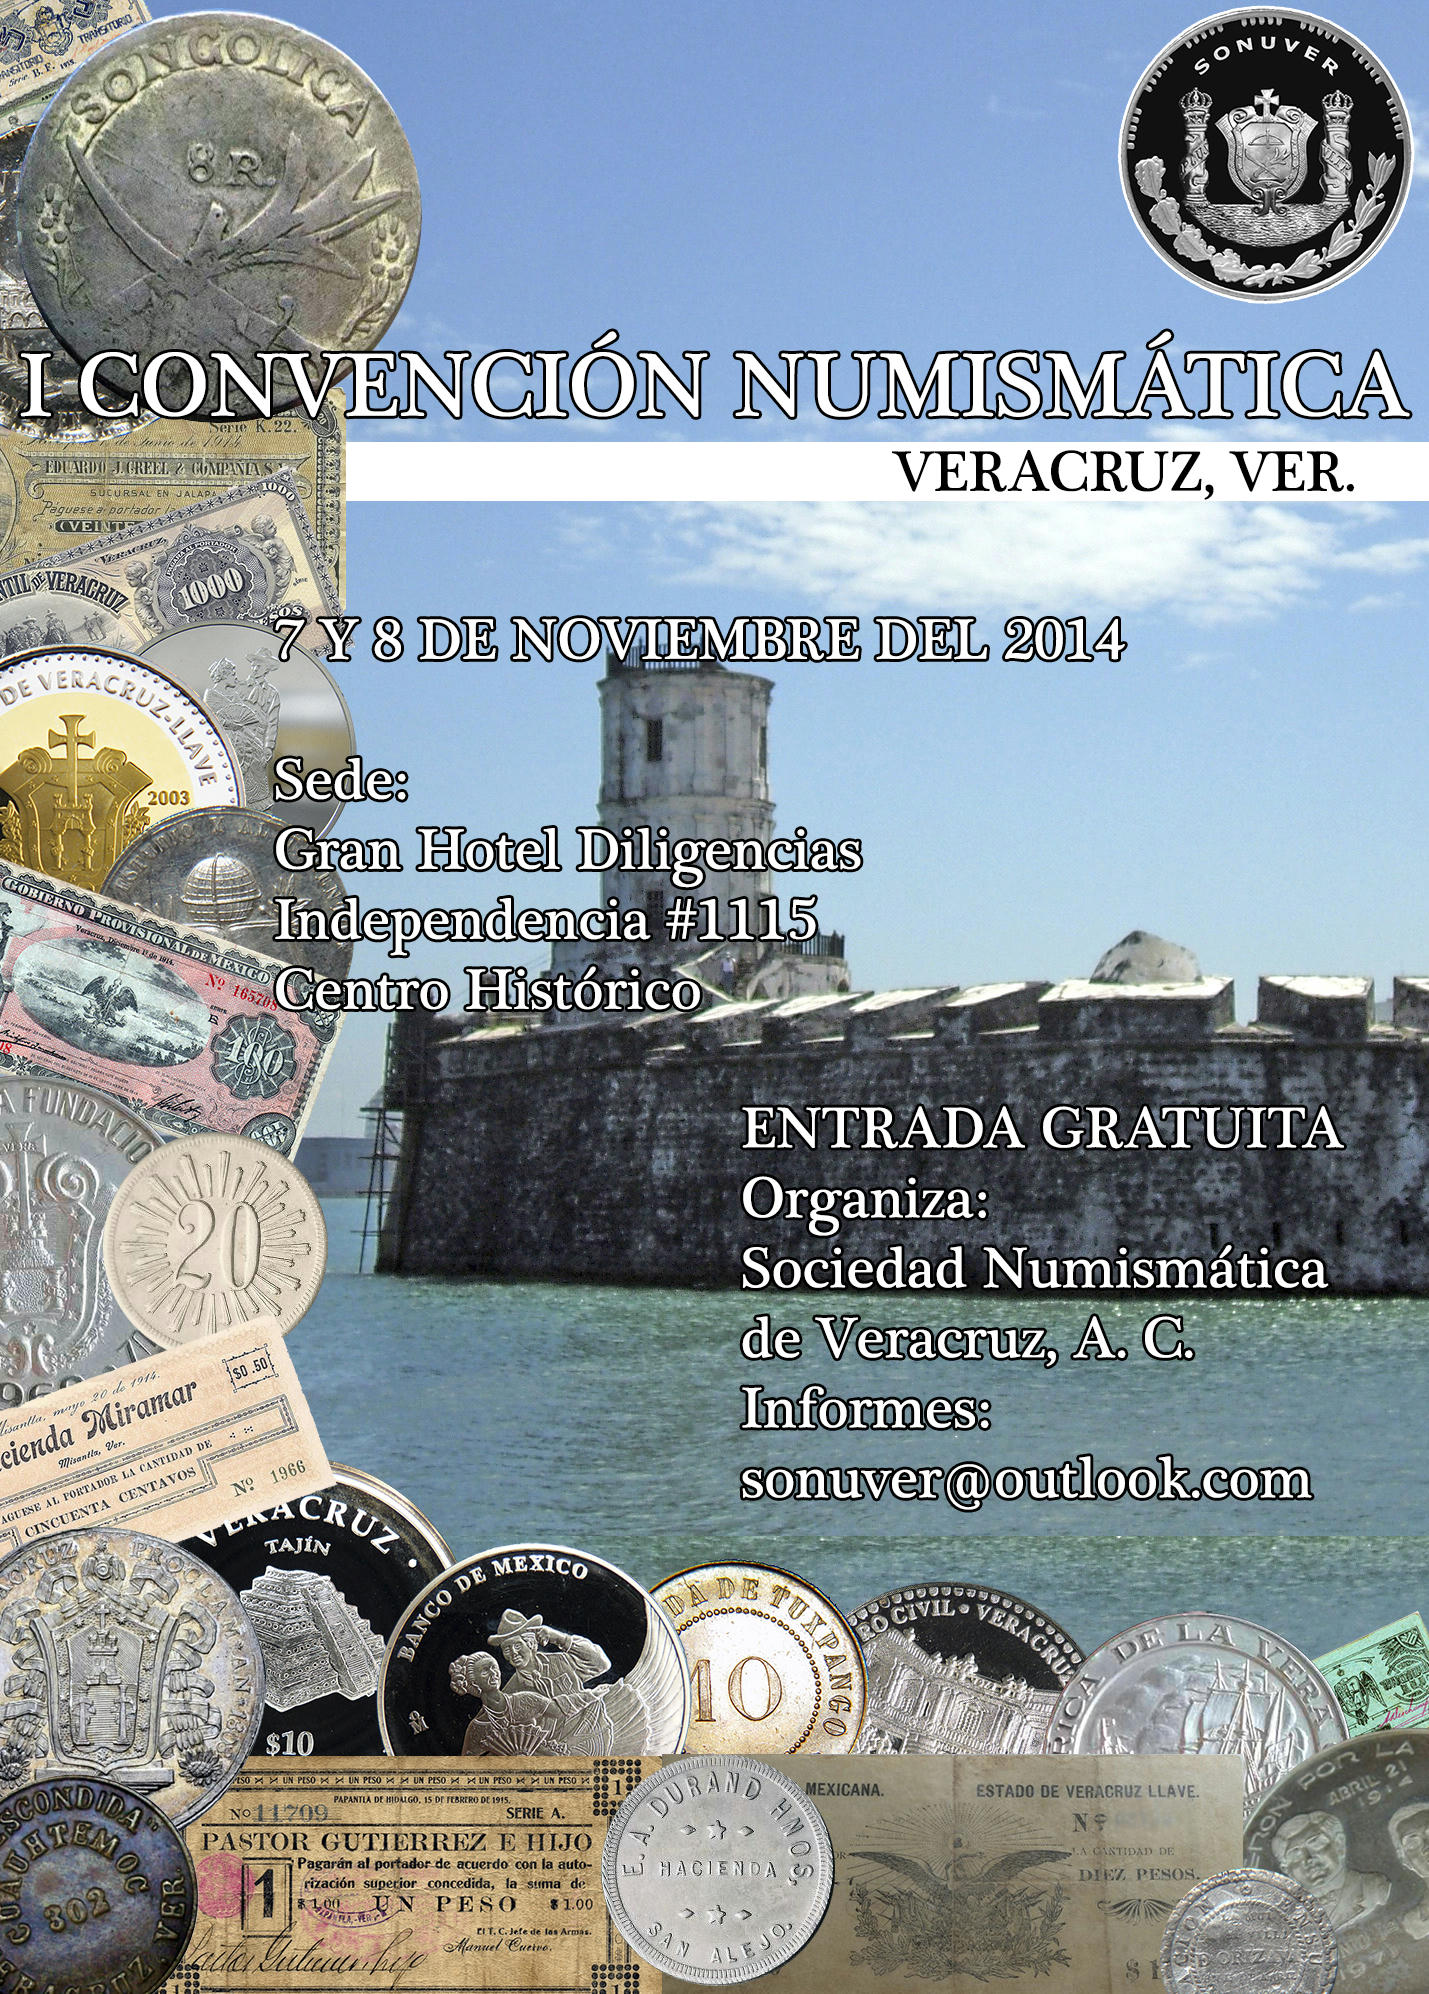 I Convención Numismática de Veracruz (México) Q233qxr3yrqu3qyfg